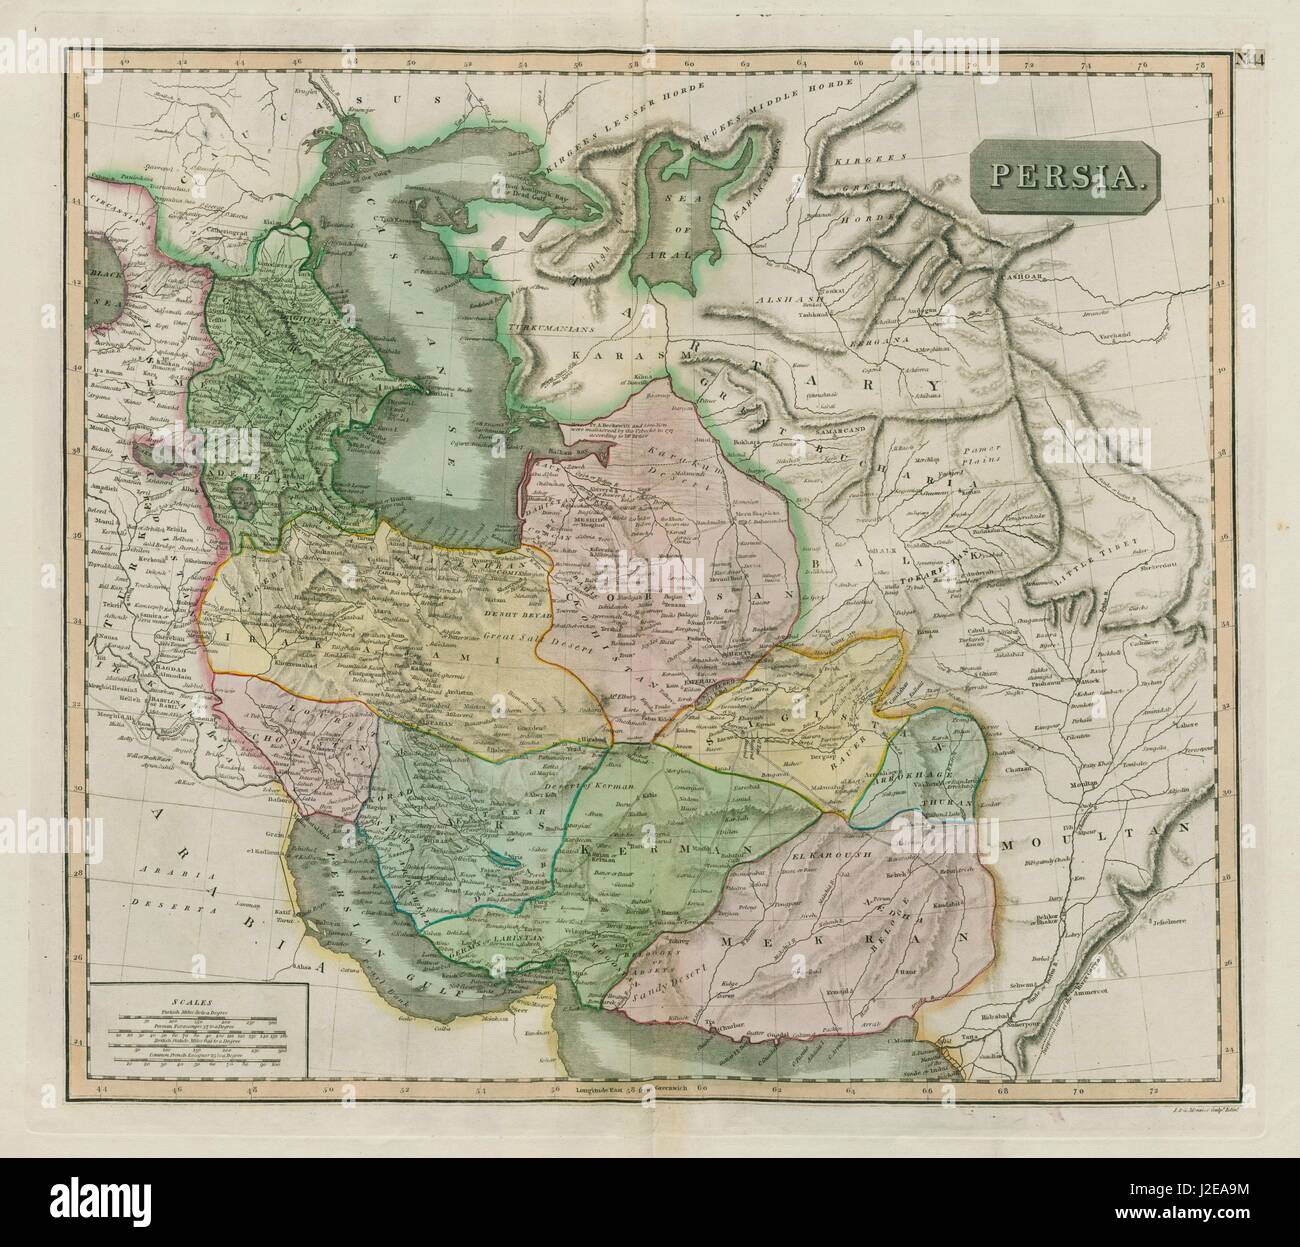 Caspian Sea Map Stock Photos & Caspian Sea Map Stock Images - Alamy